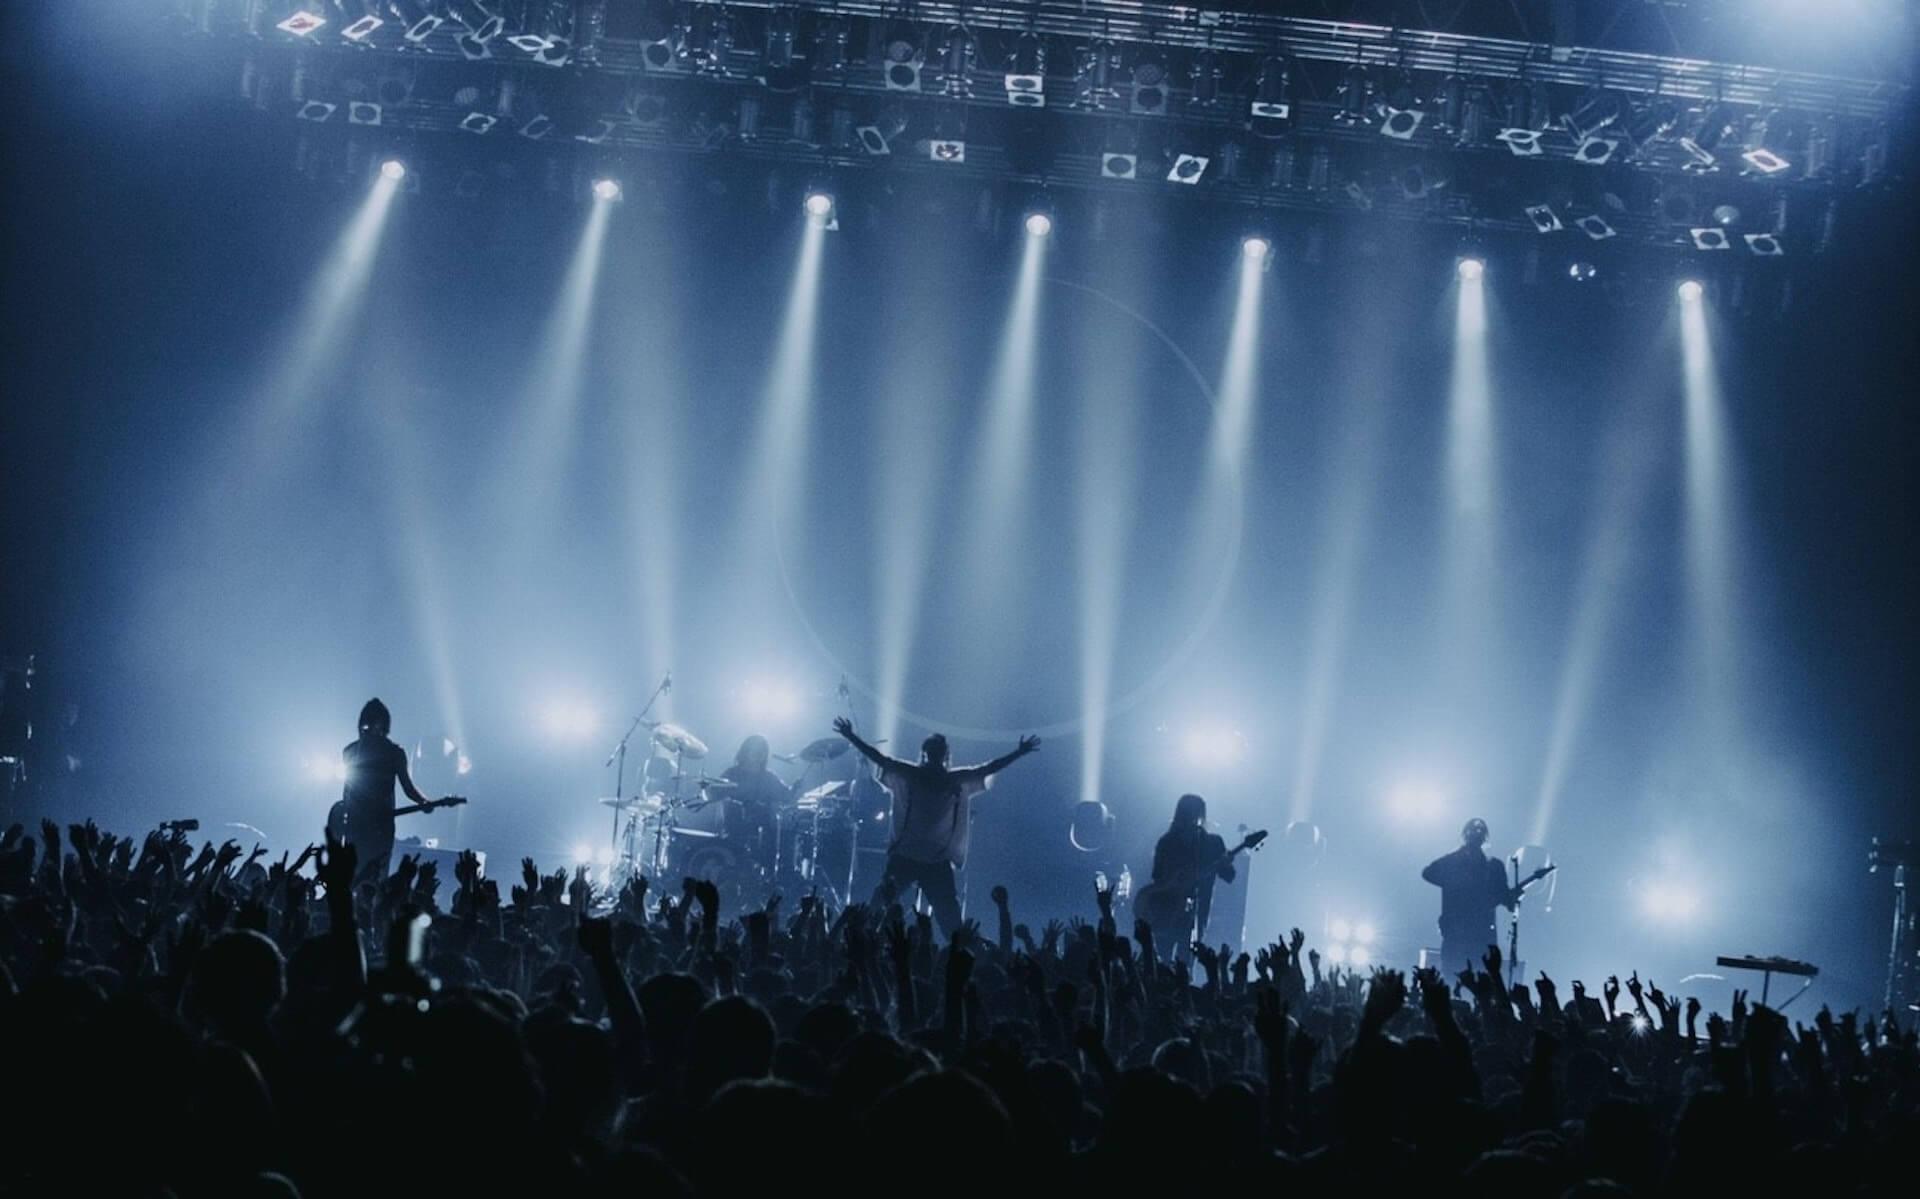 Survive Said The Prophetライブレポート|ワールドツアー直前!観客とのシンガロングで作り上げた奇跡の一夜 SSTP_07